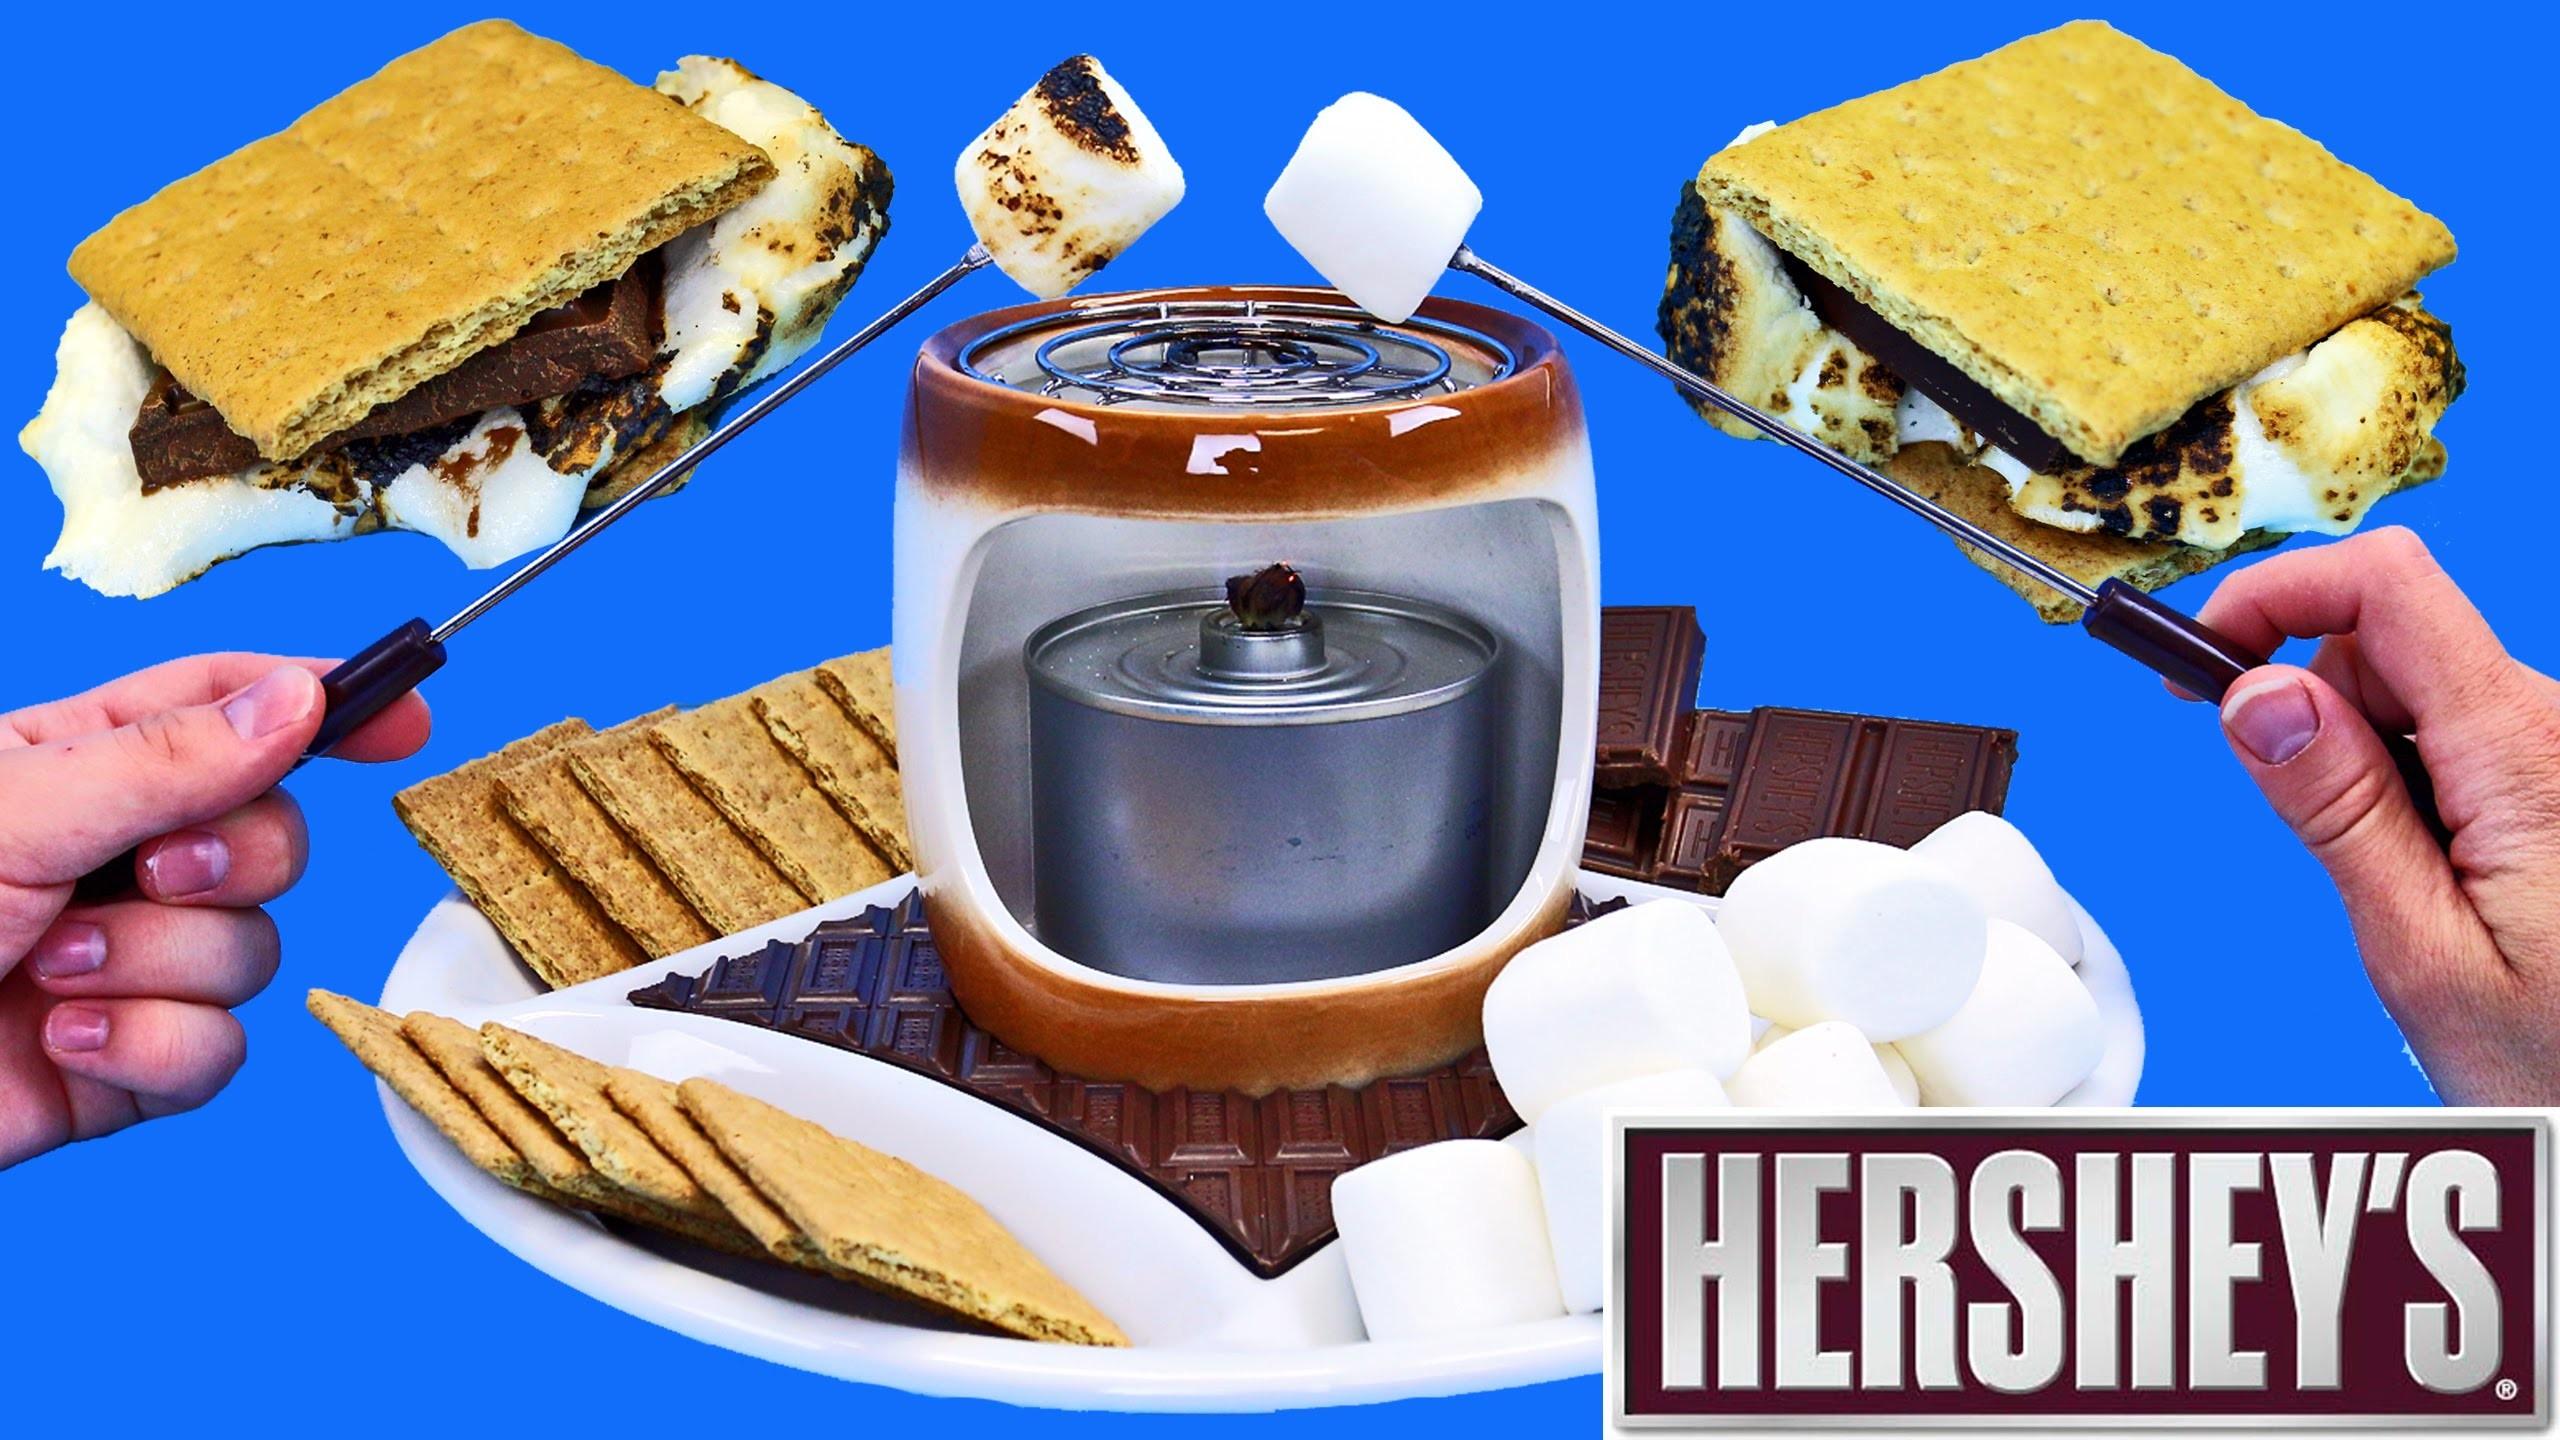 Hershey's Chocolate S'Mores Maker DIY Indoor Smores + DIY Chocolate Candy Dessert by DisneyCarToys